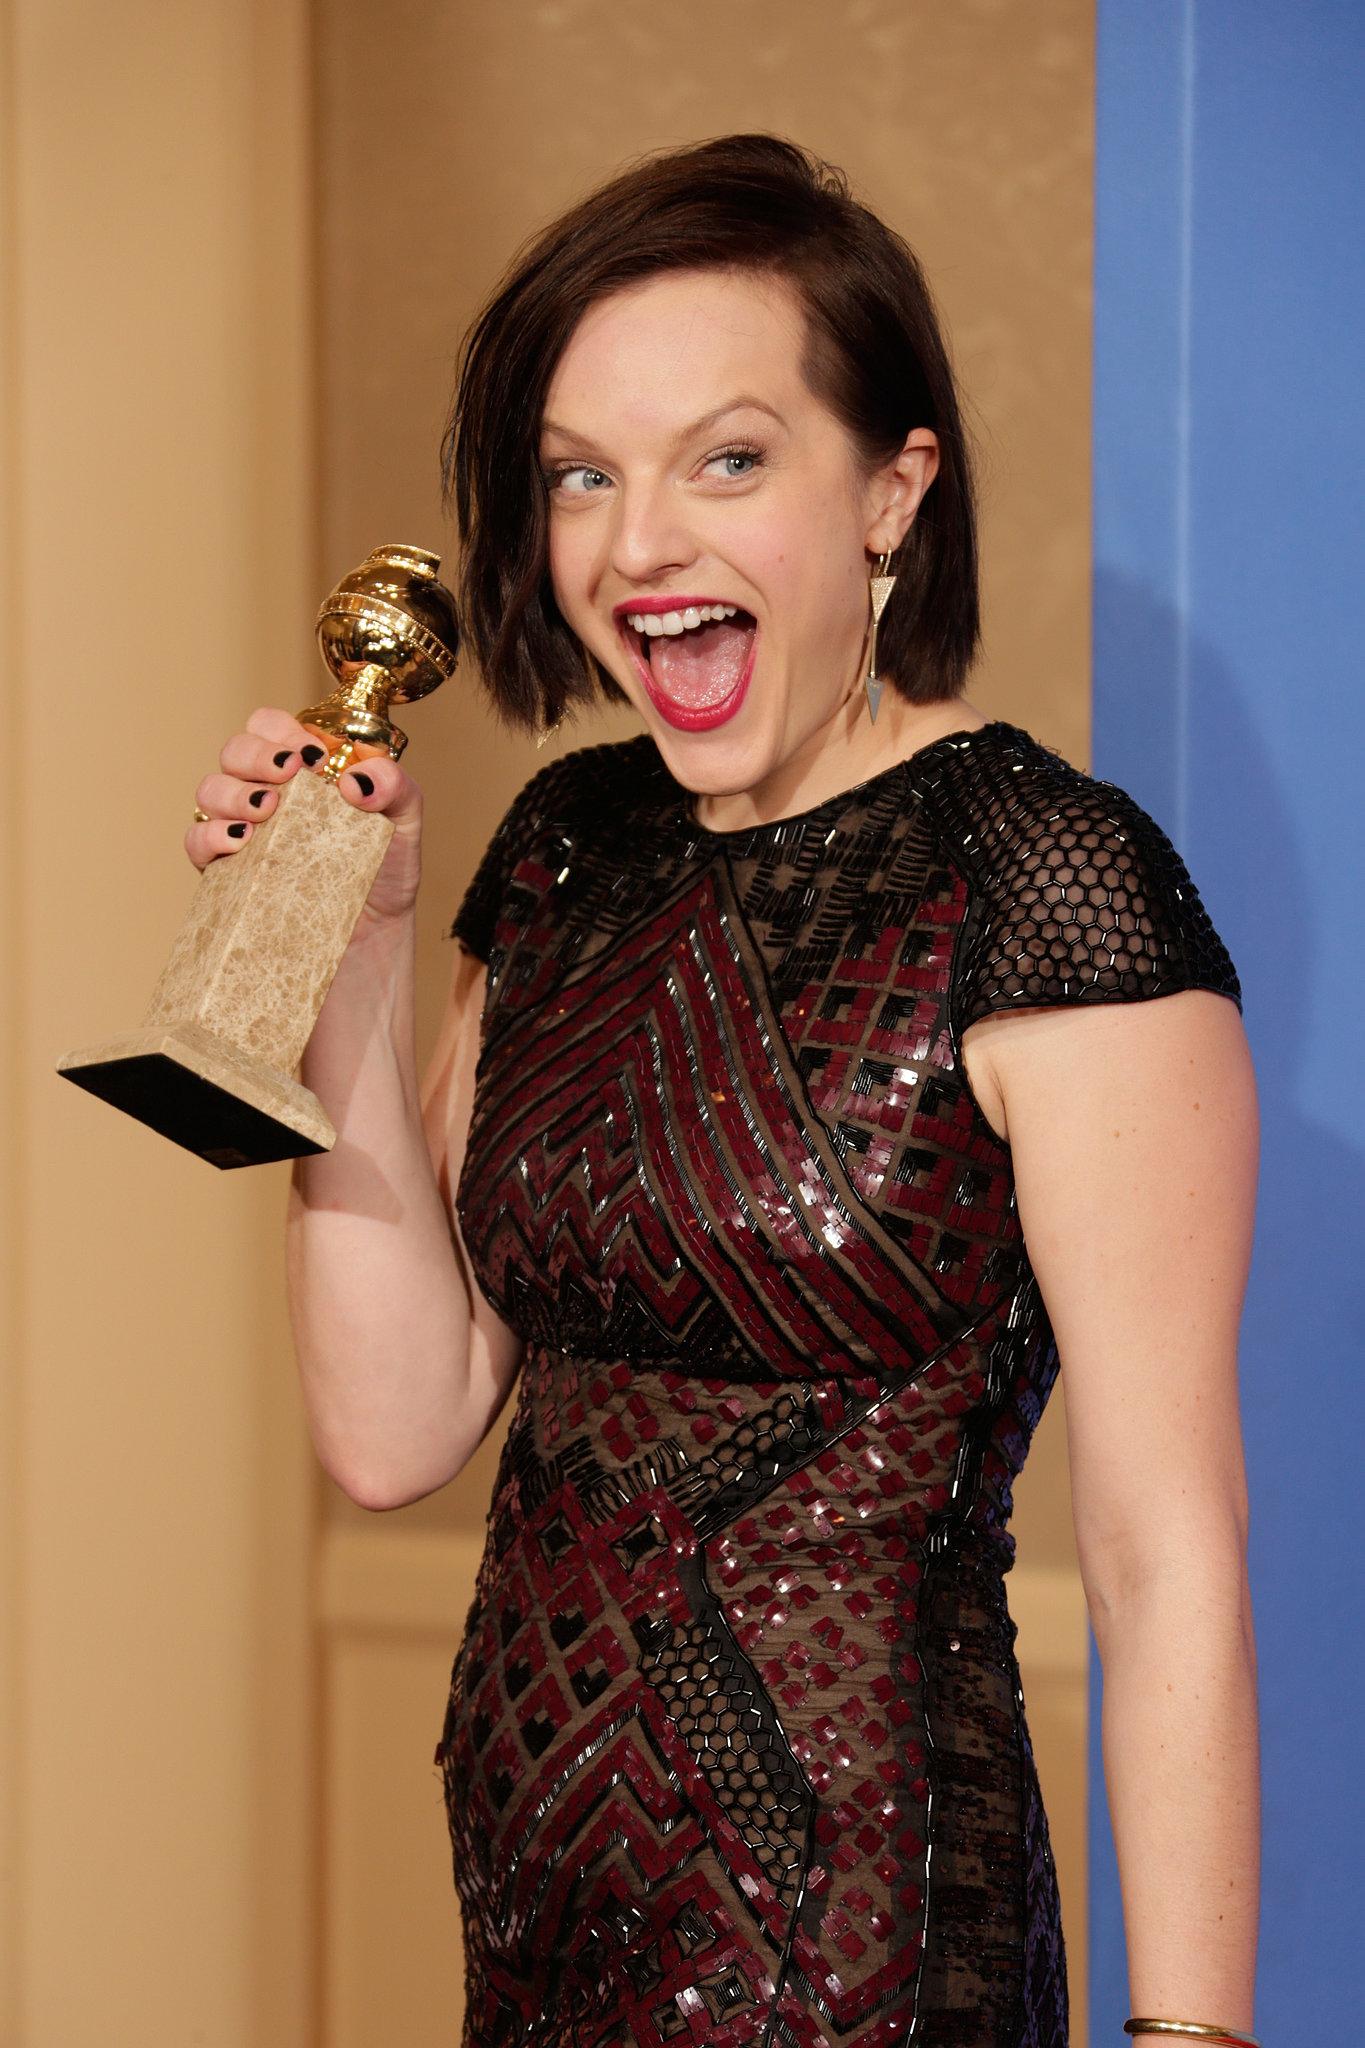 Elisabeth Moss showed her shocked face as she celebrated her Globe win backstage.